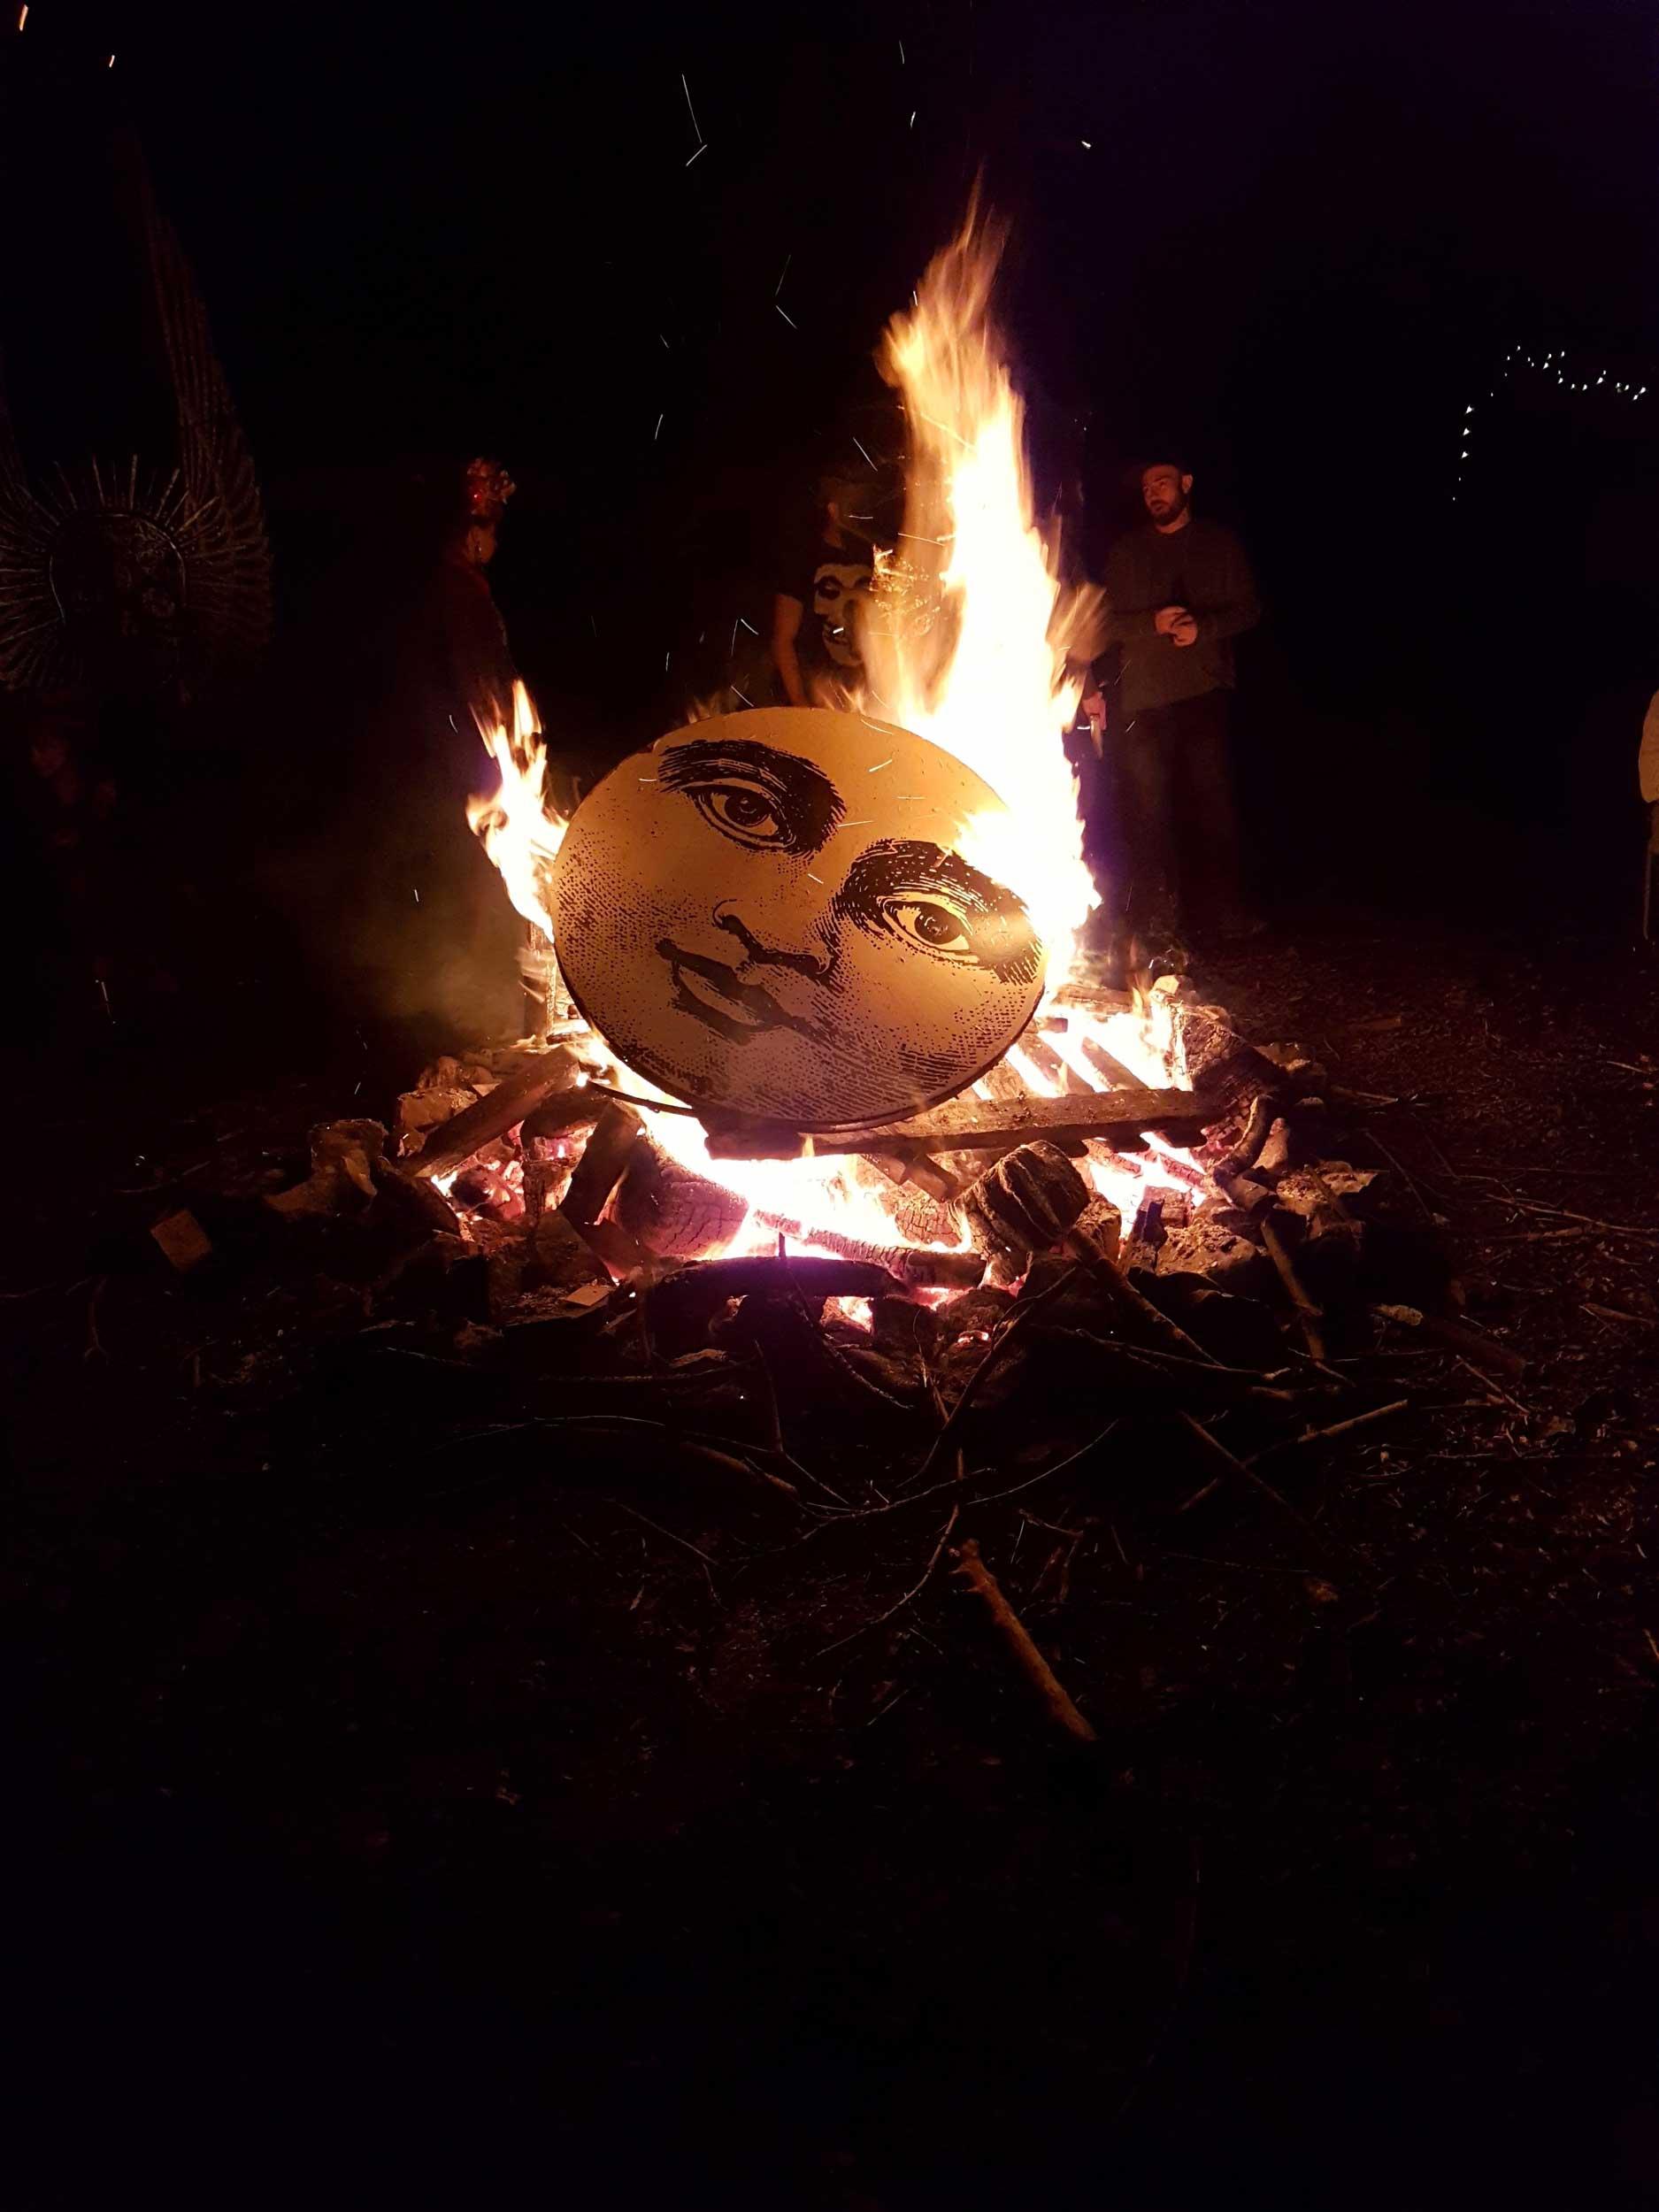 woolywoody-farm-fest-2017-moon-on-fire-rachel-kiernan-sculpture-painting-burning-moon